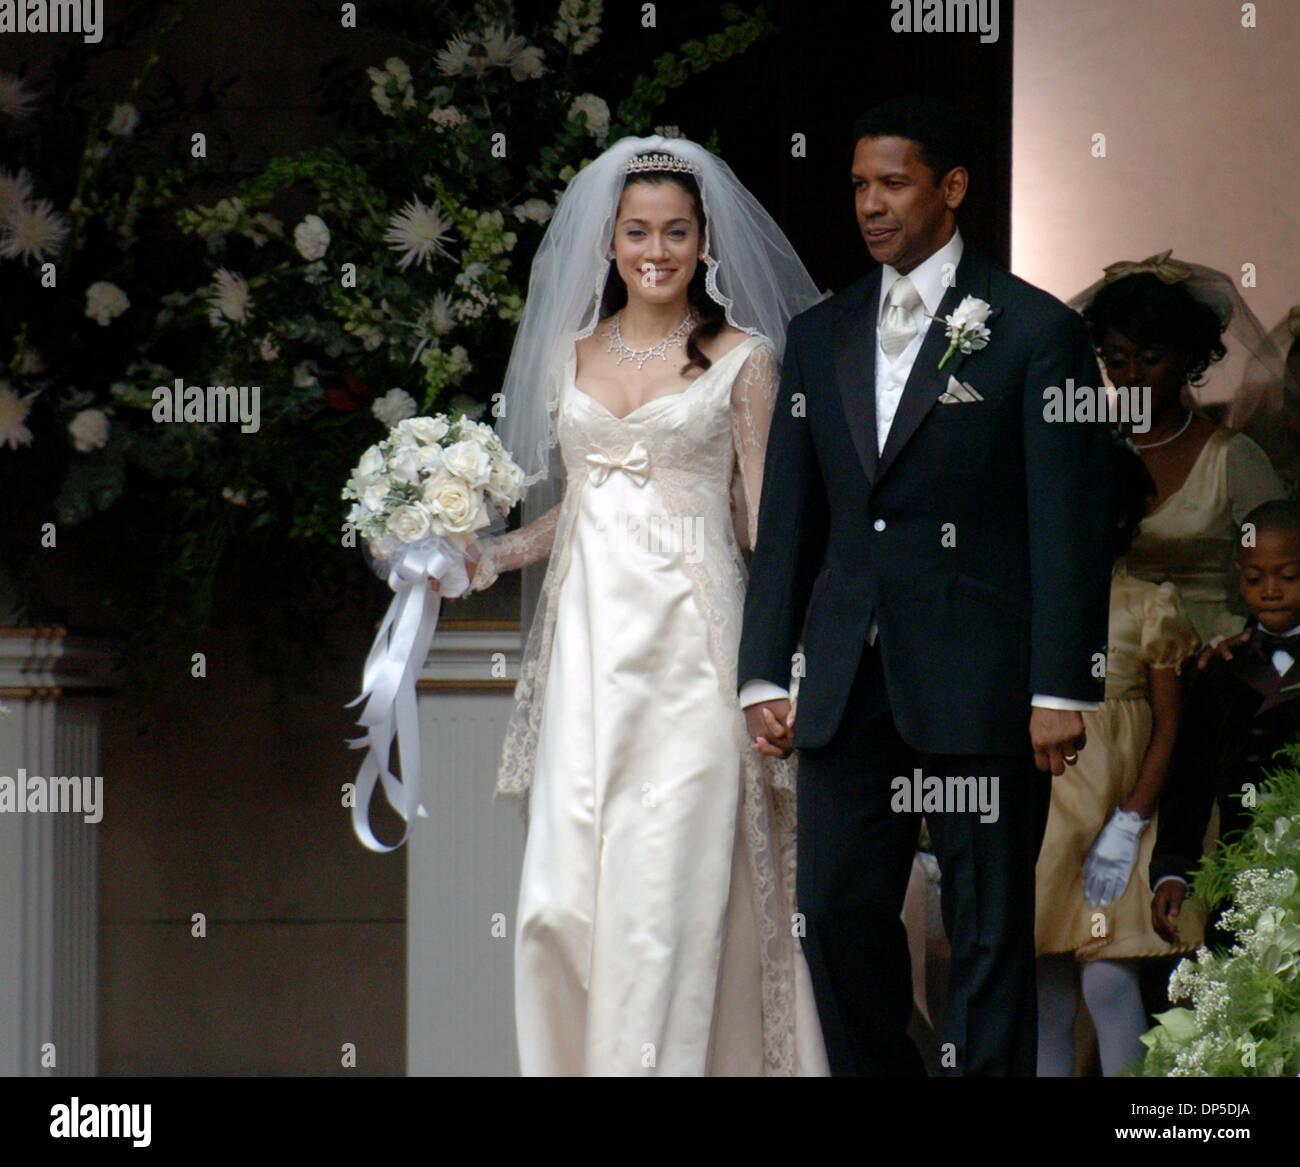 American Wedding Cast: Sep 13, 2006; Manhattan, NY, USA; Actors DENZEL WASHINGTON